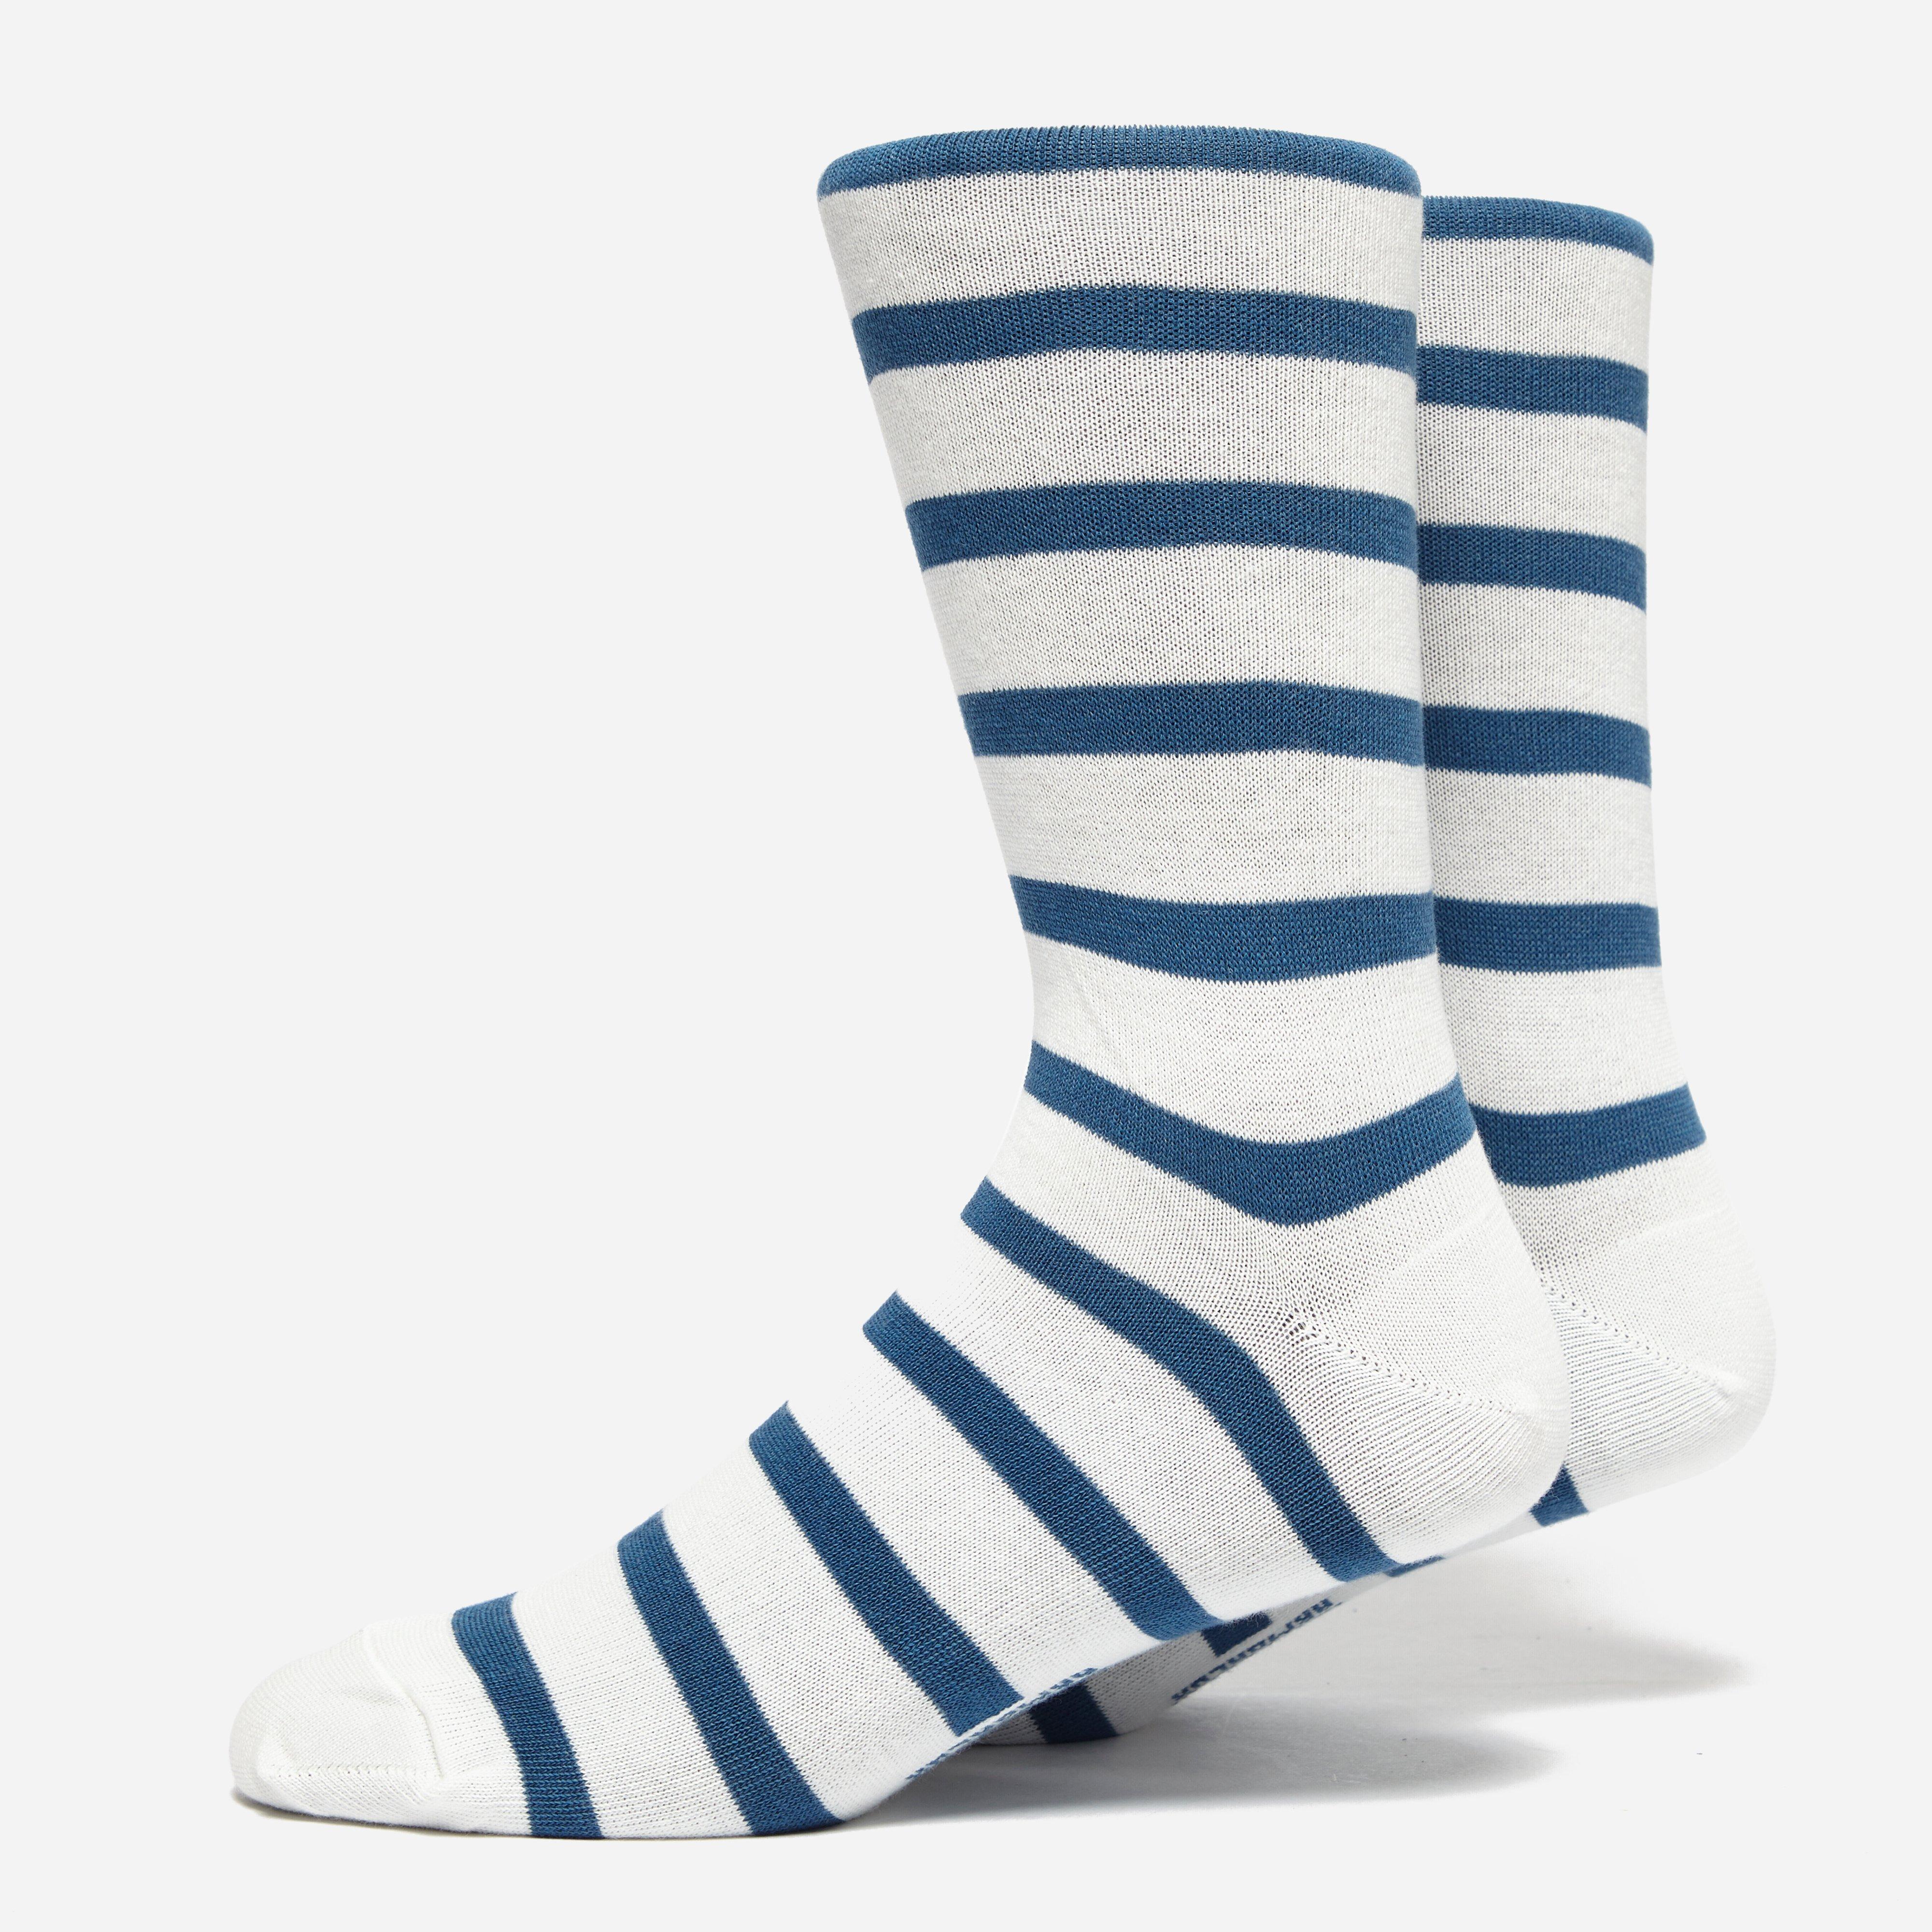 Armor Lux 02770 Socks